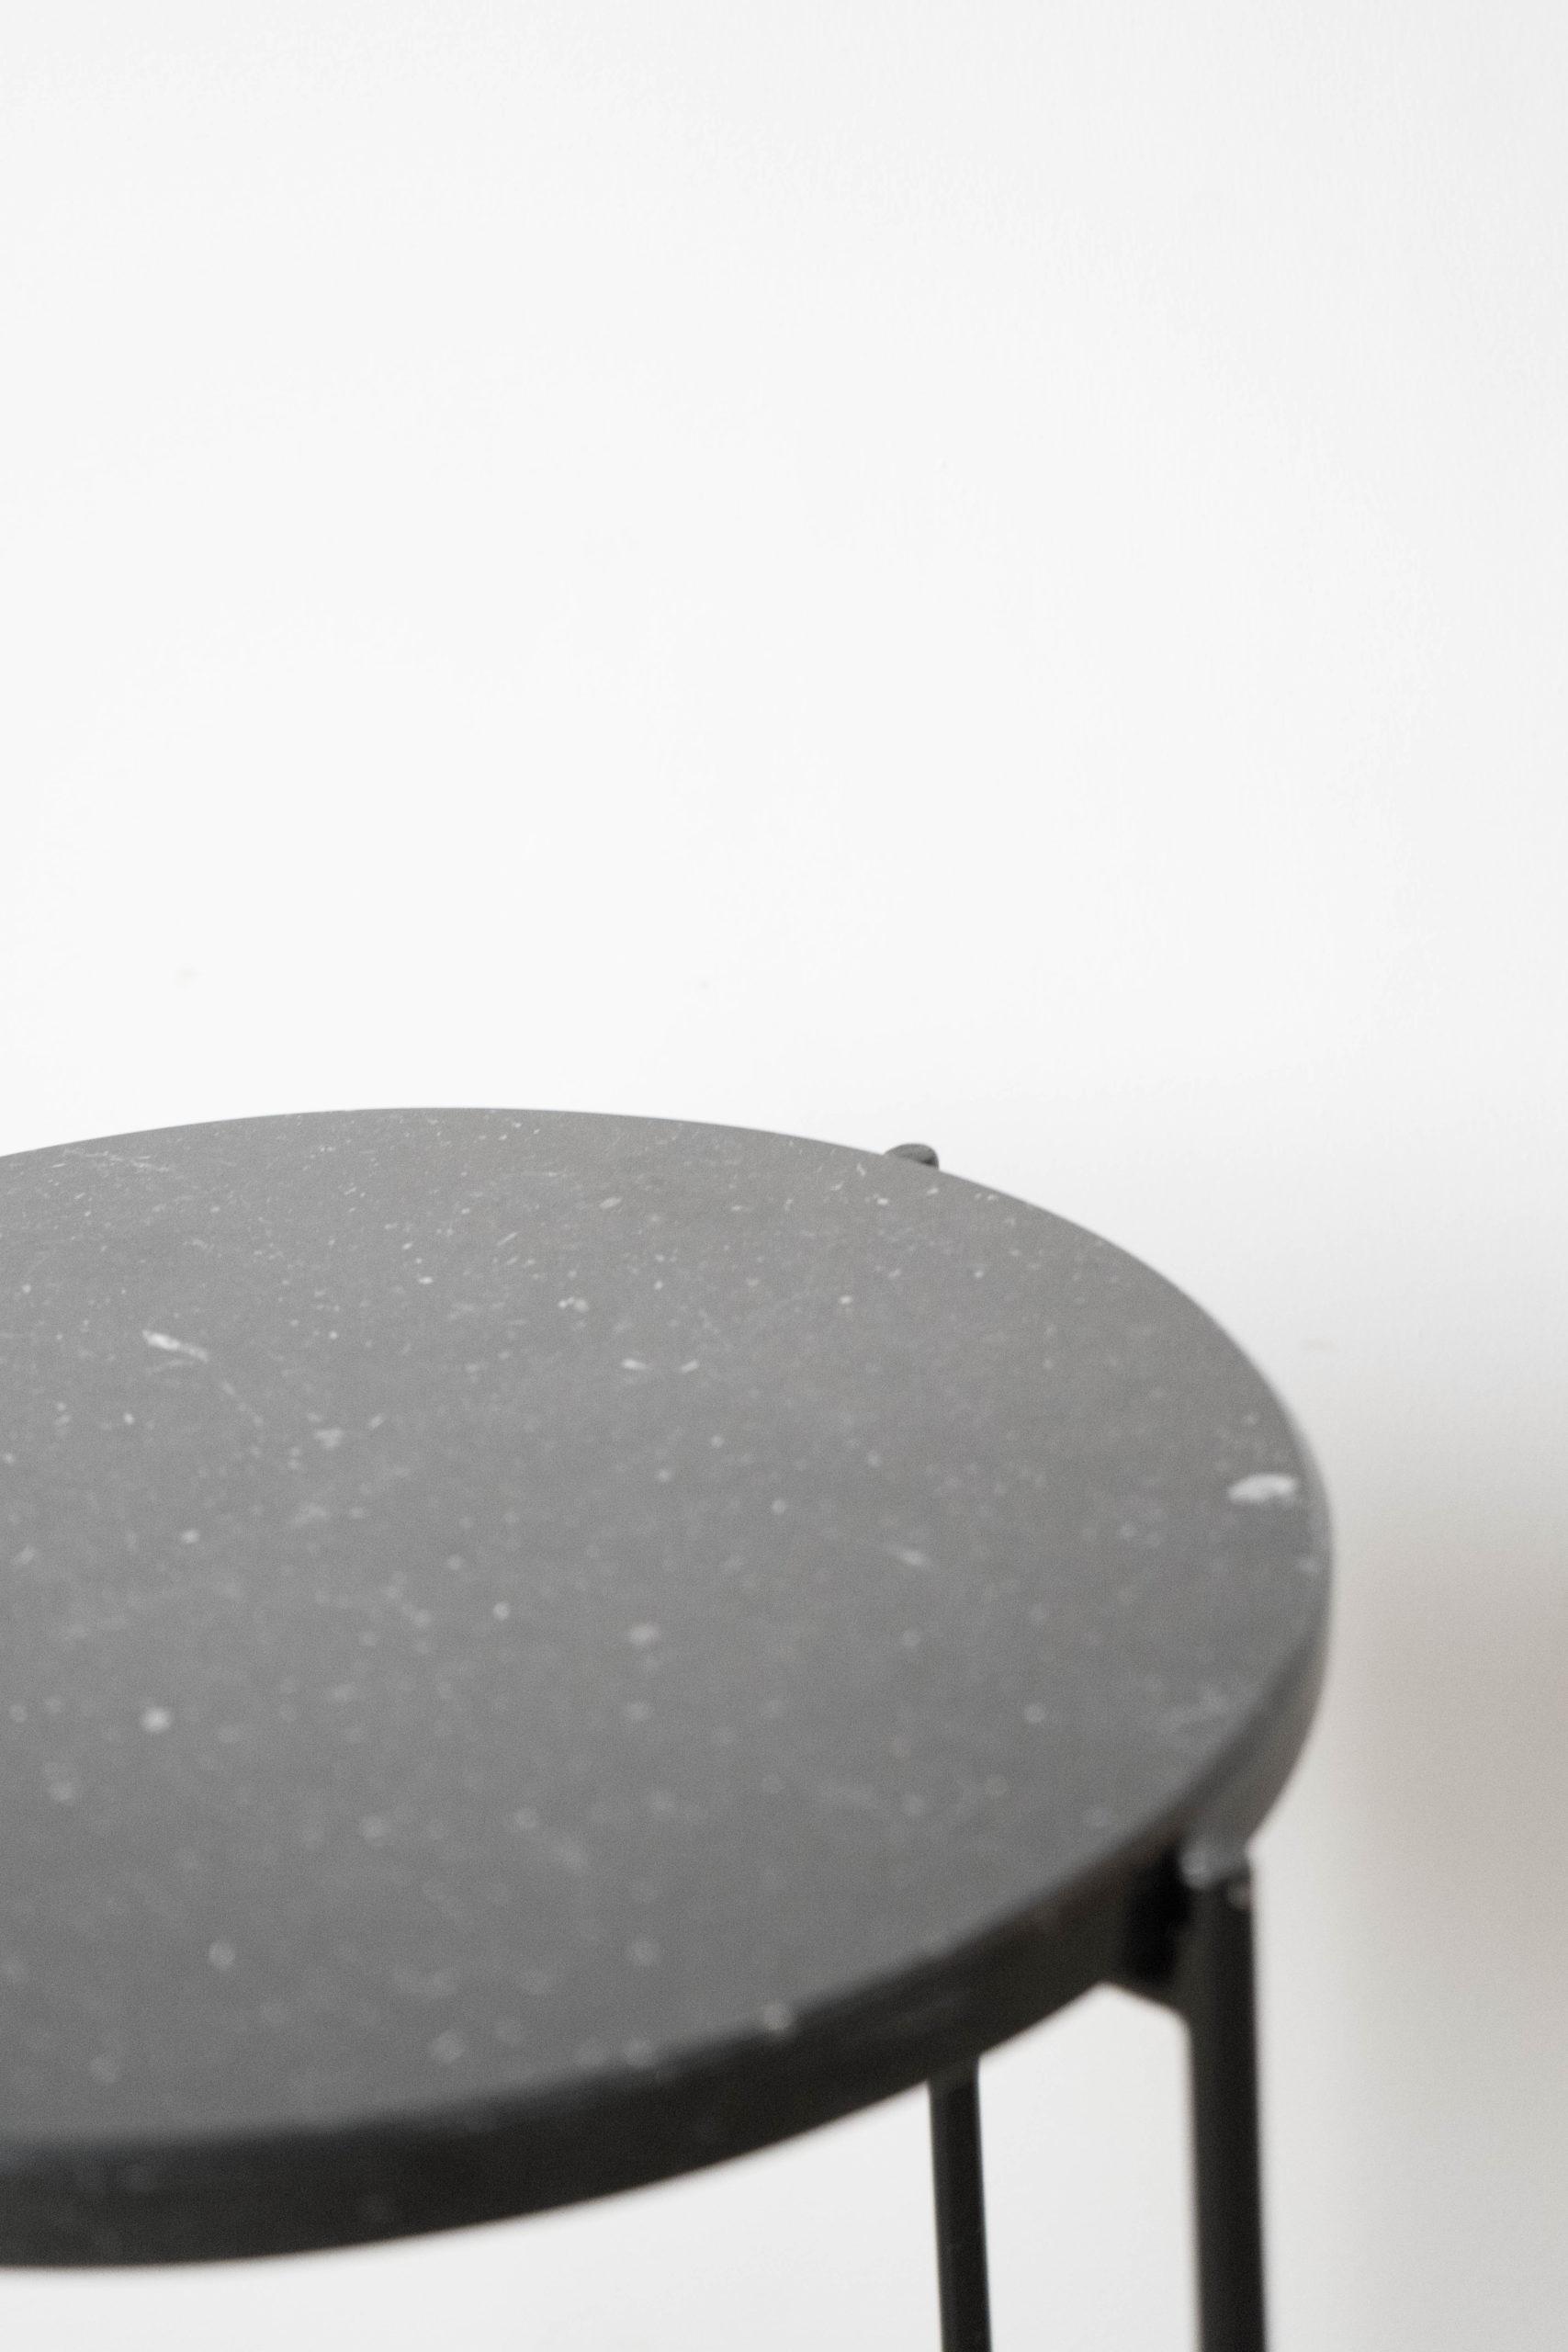 detalle de marmol mesita auxiliar negra